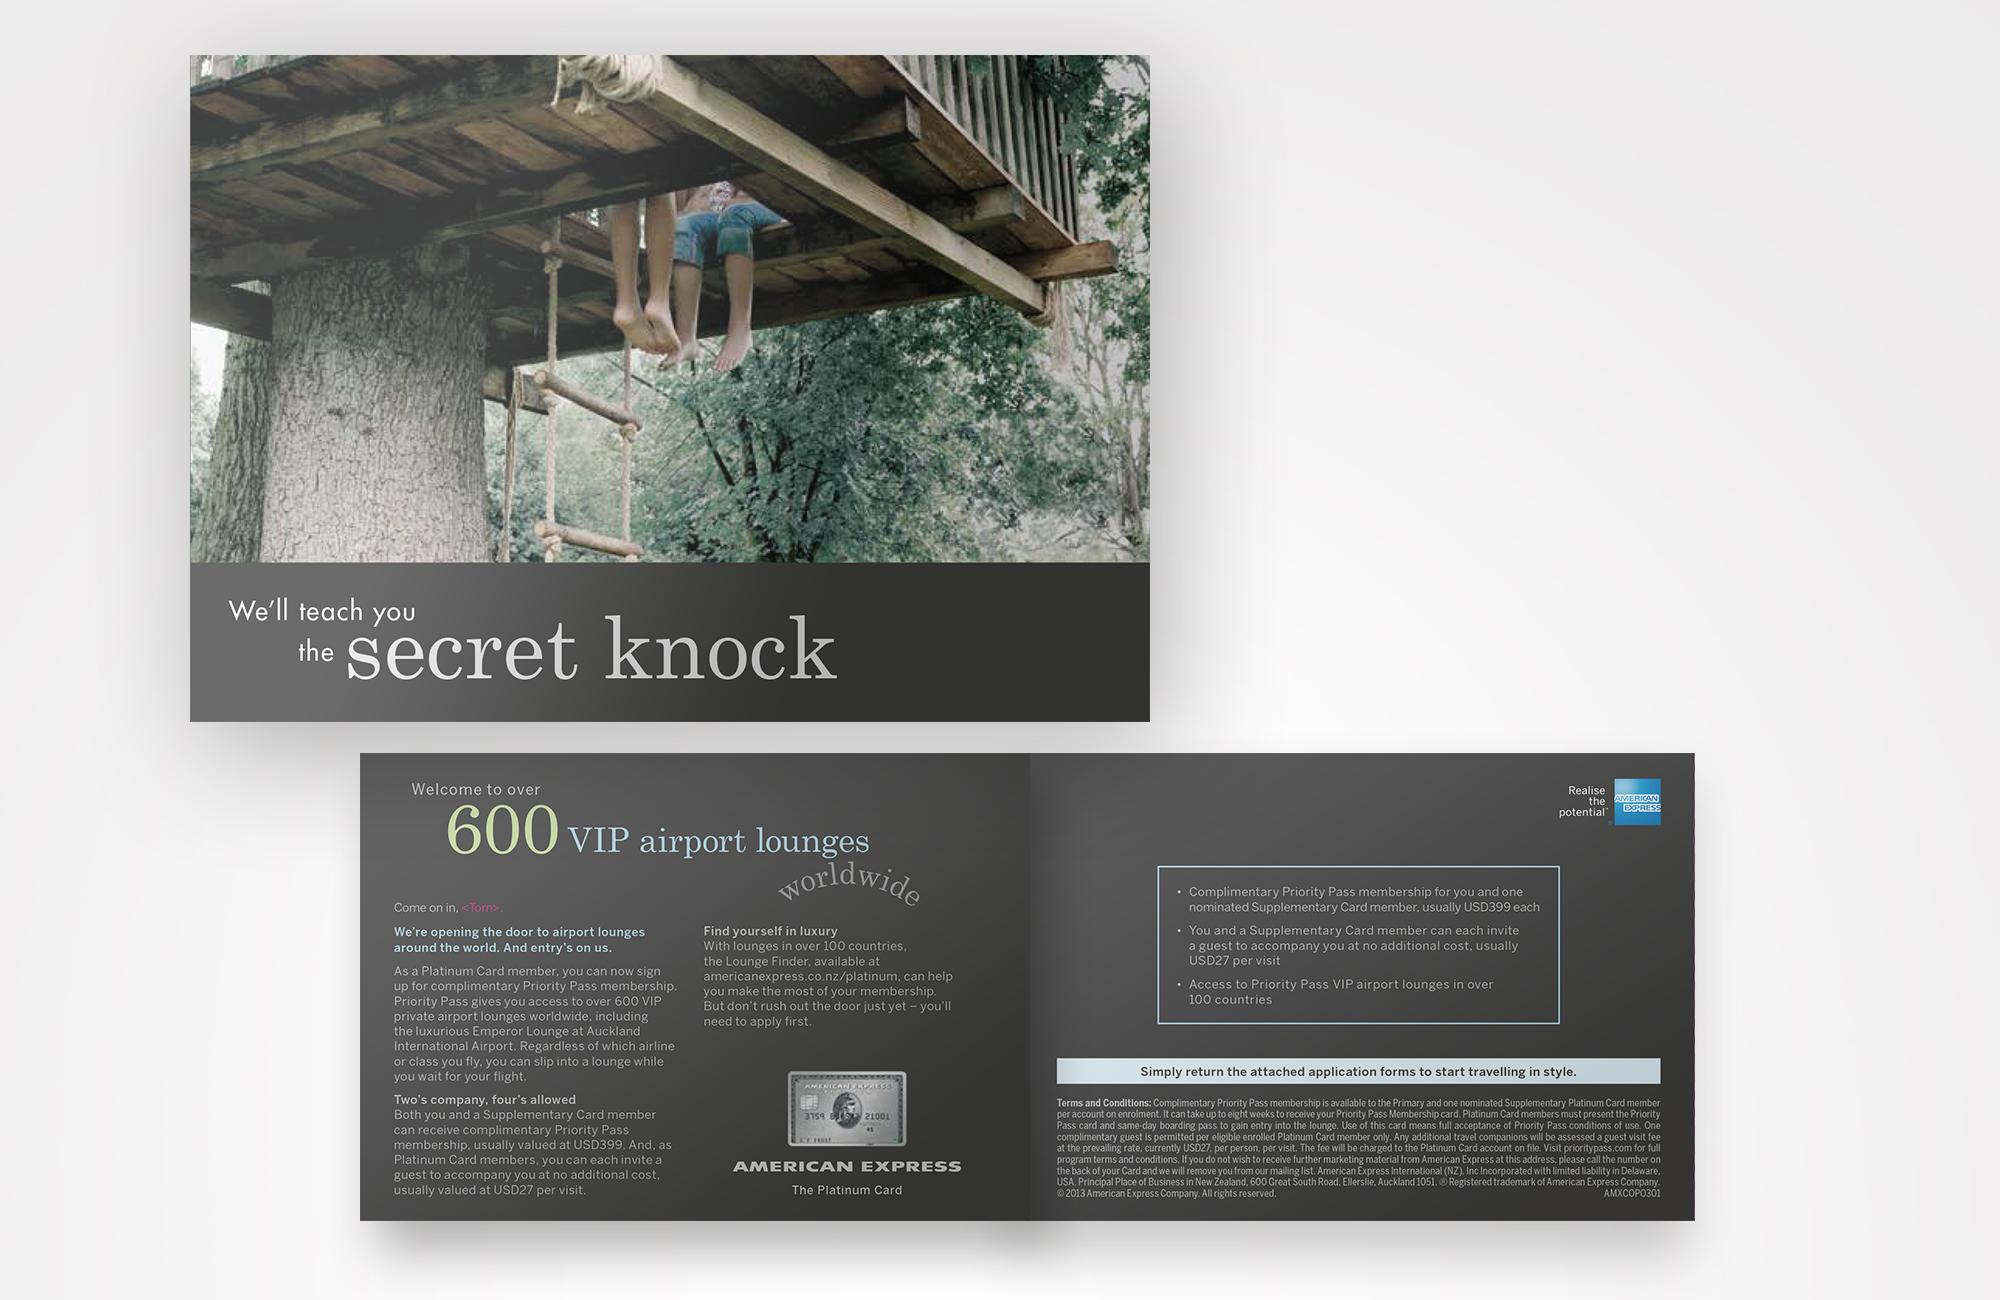 SecretKnock_DM.jpg